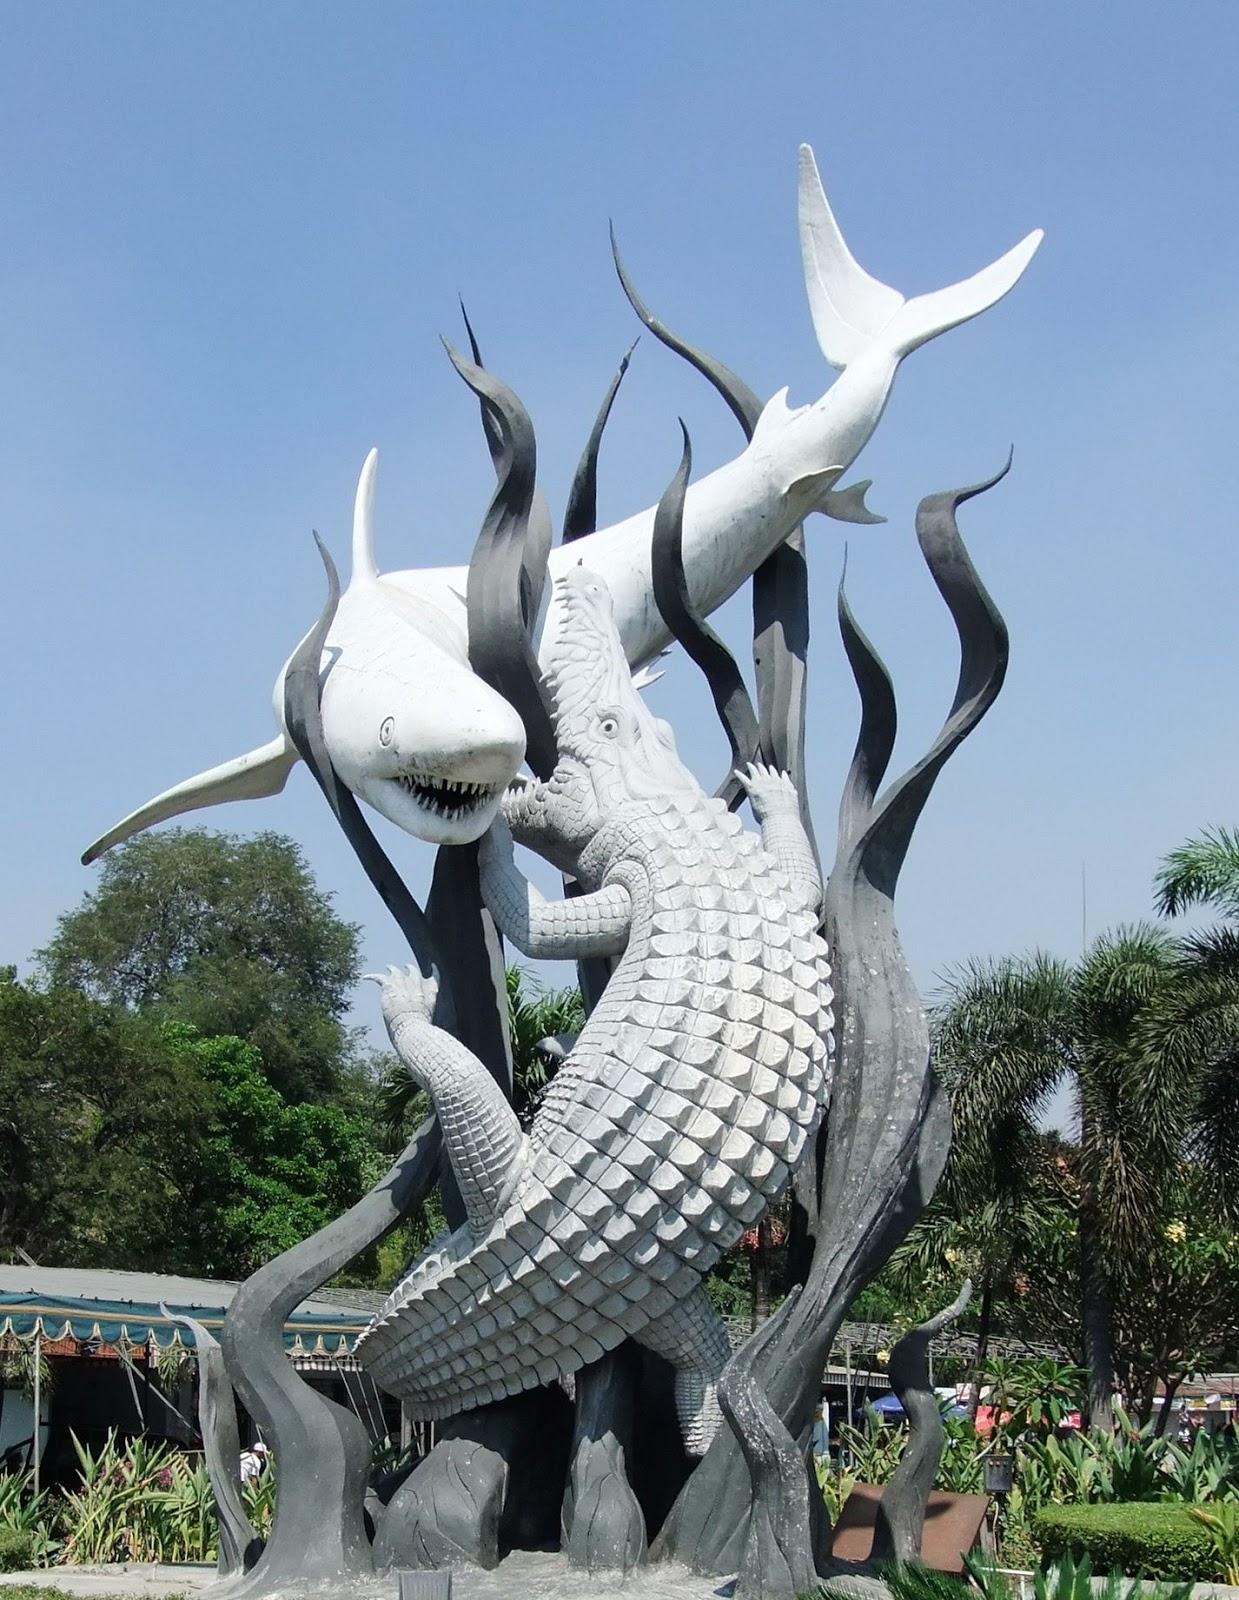 Daftar Lengkap Nama Tempat Wisata Surabaya Terkenal 2018 Check Ya